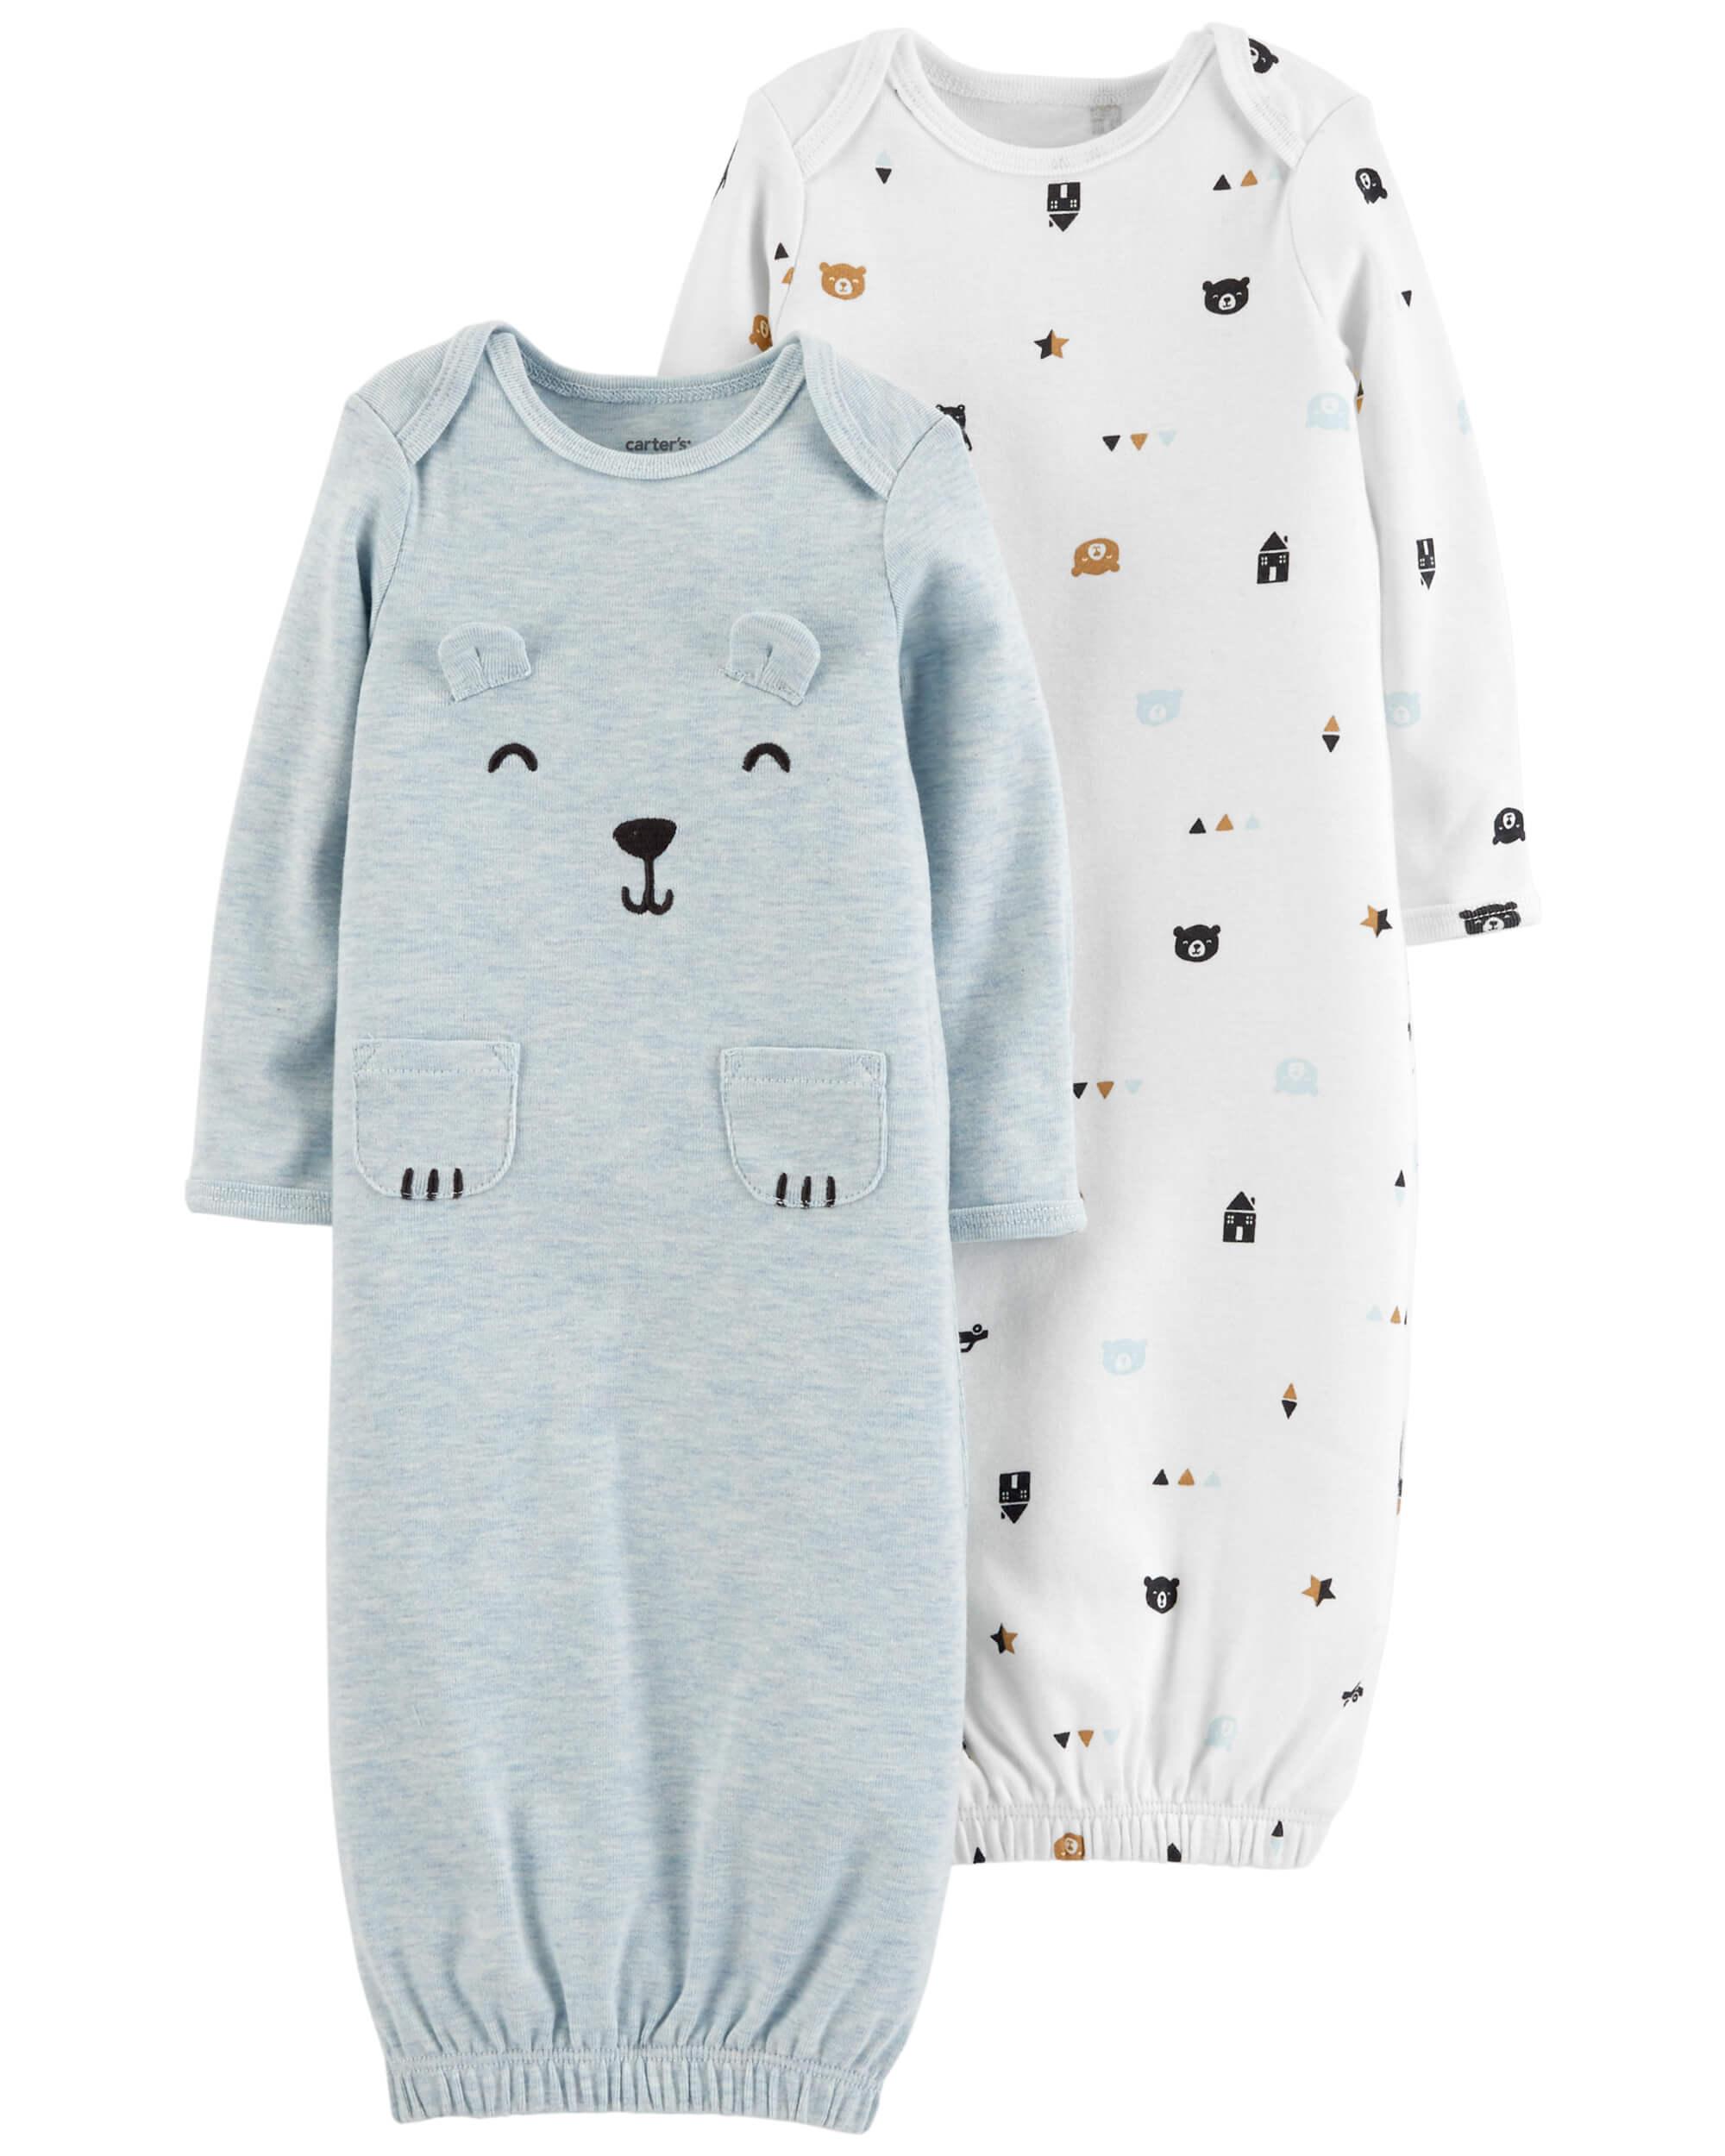 0b039cd84ae Carter's Φόρμες ύπνου σετ των δύο τεμαχίων, μπλέ -λευκή με σχέδιο πρόσωπο  αρκουδάκι